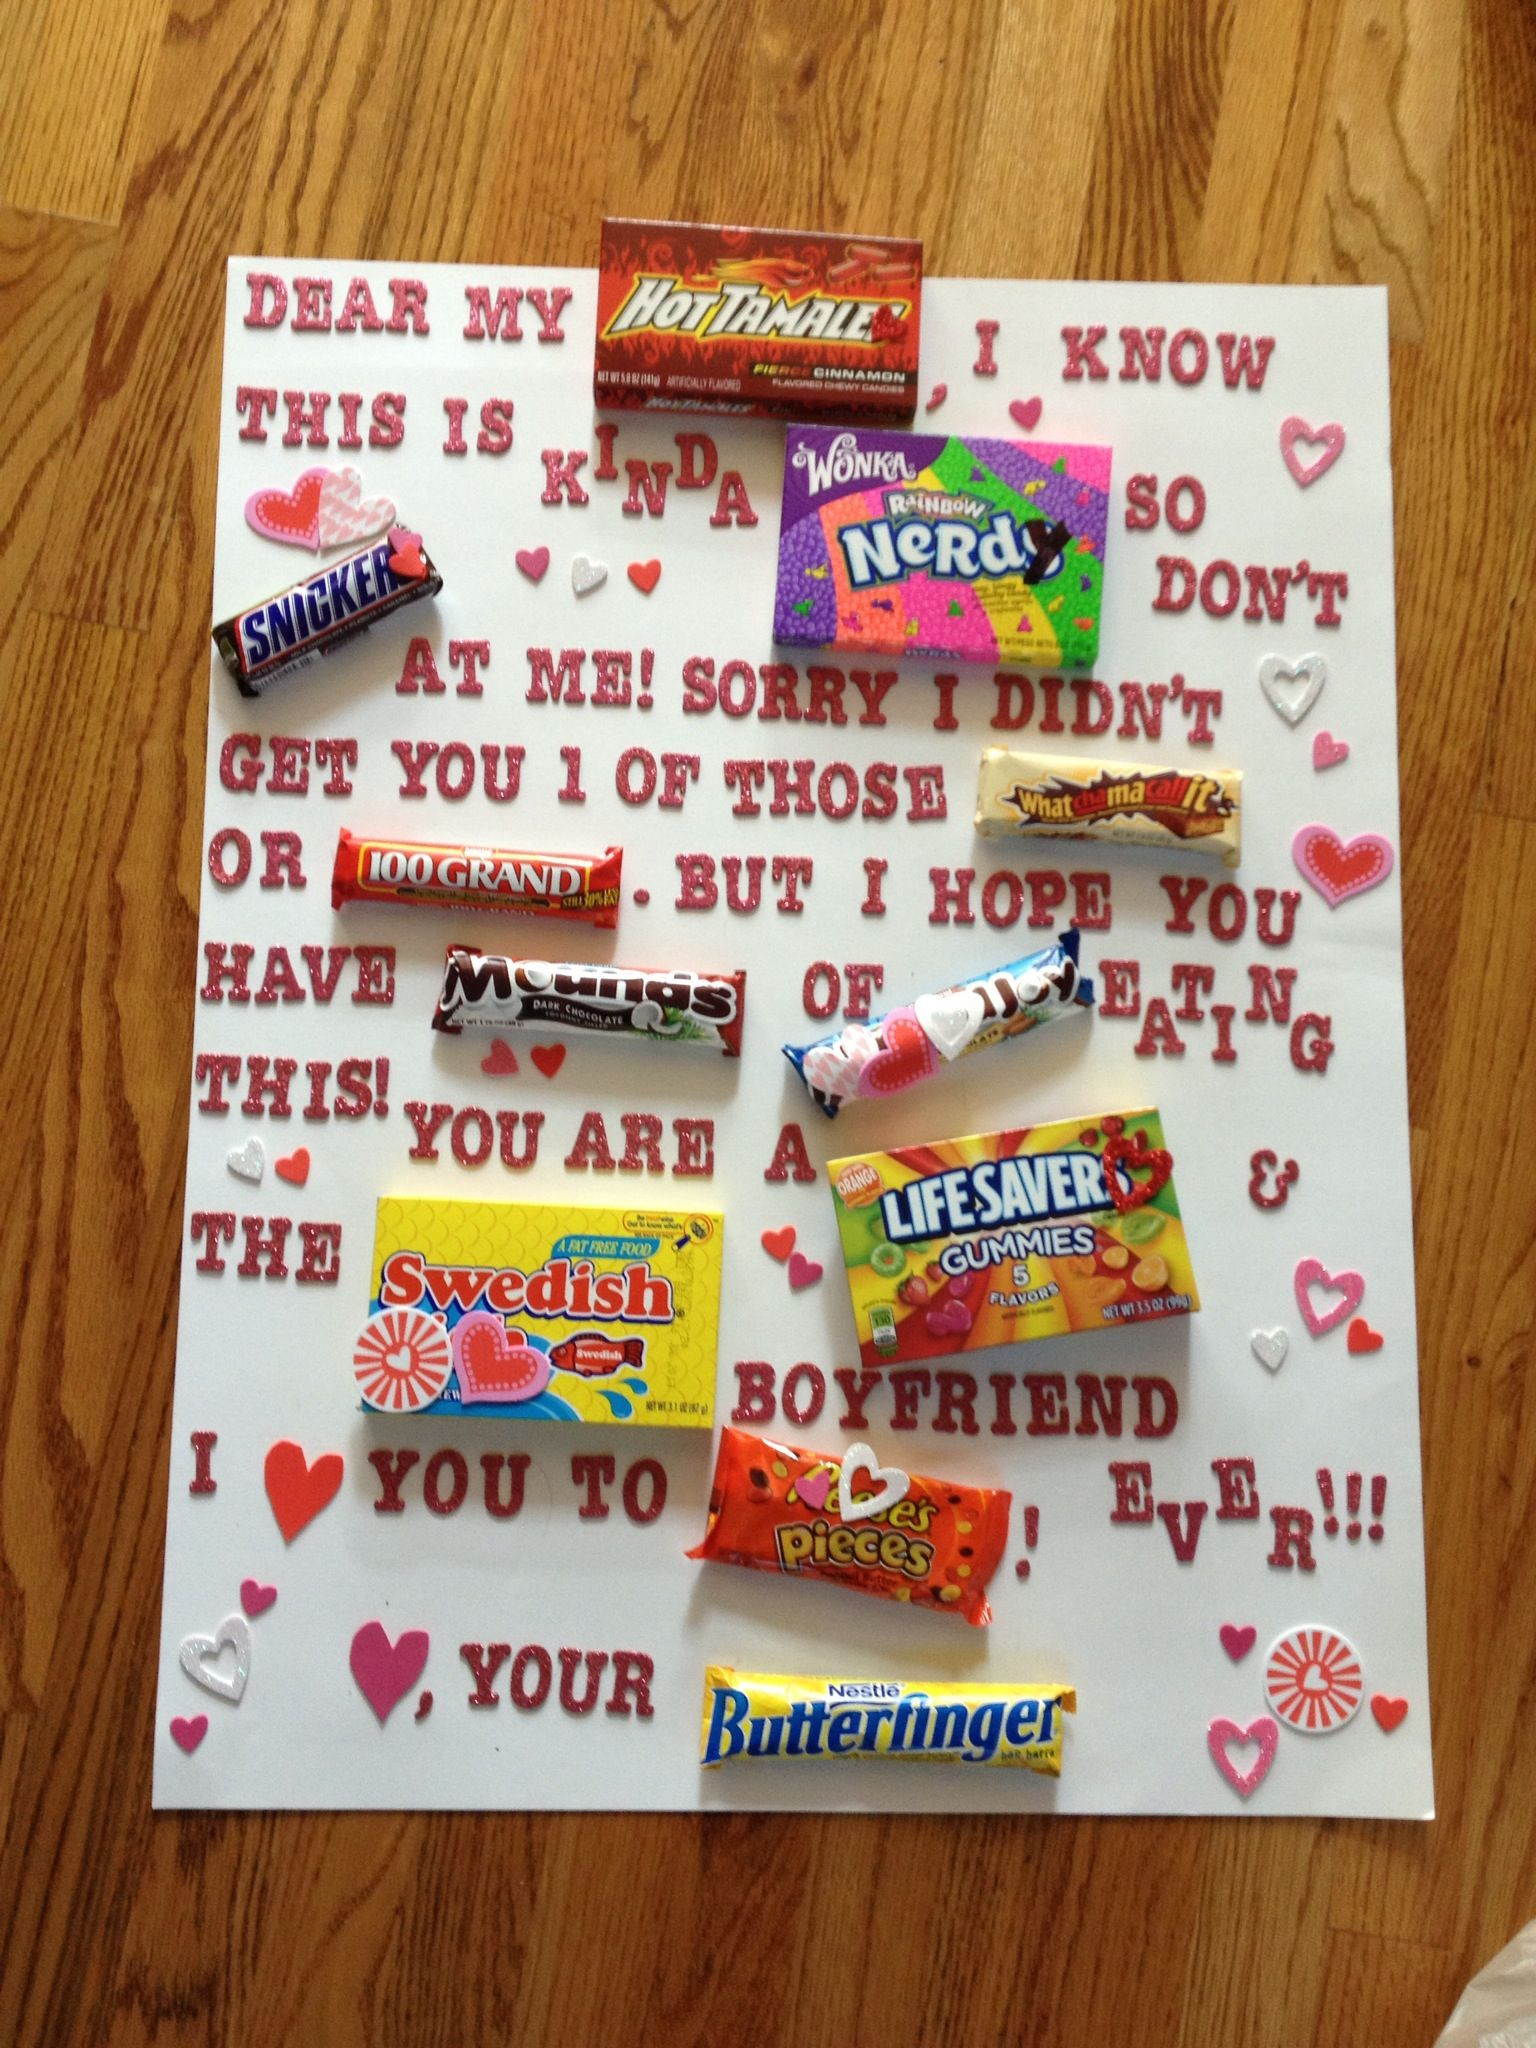 DIY Valentine'S Day Gifts For Boyfriend  What I made my boyfriend for Valentines day